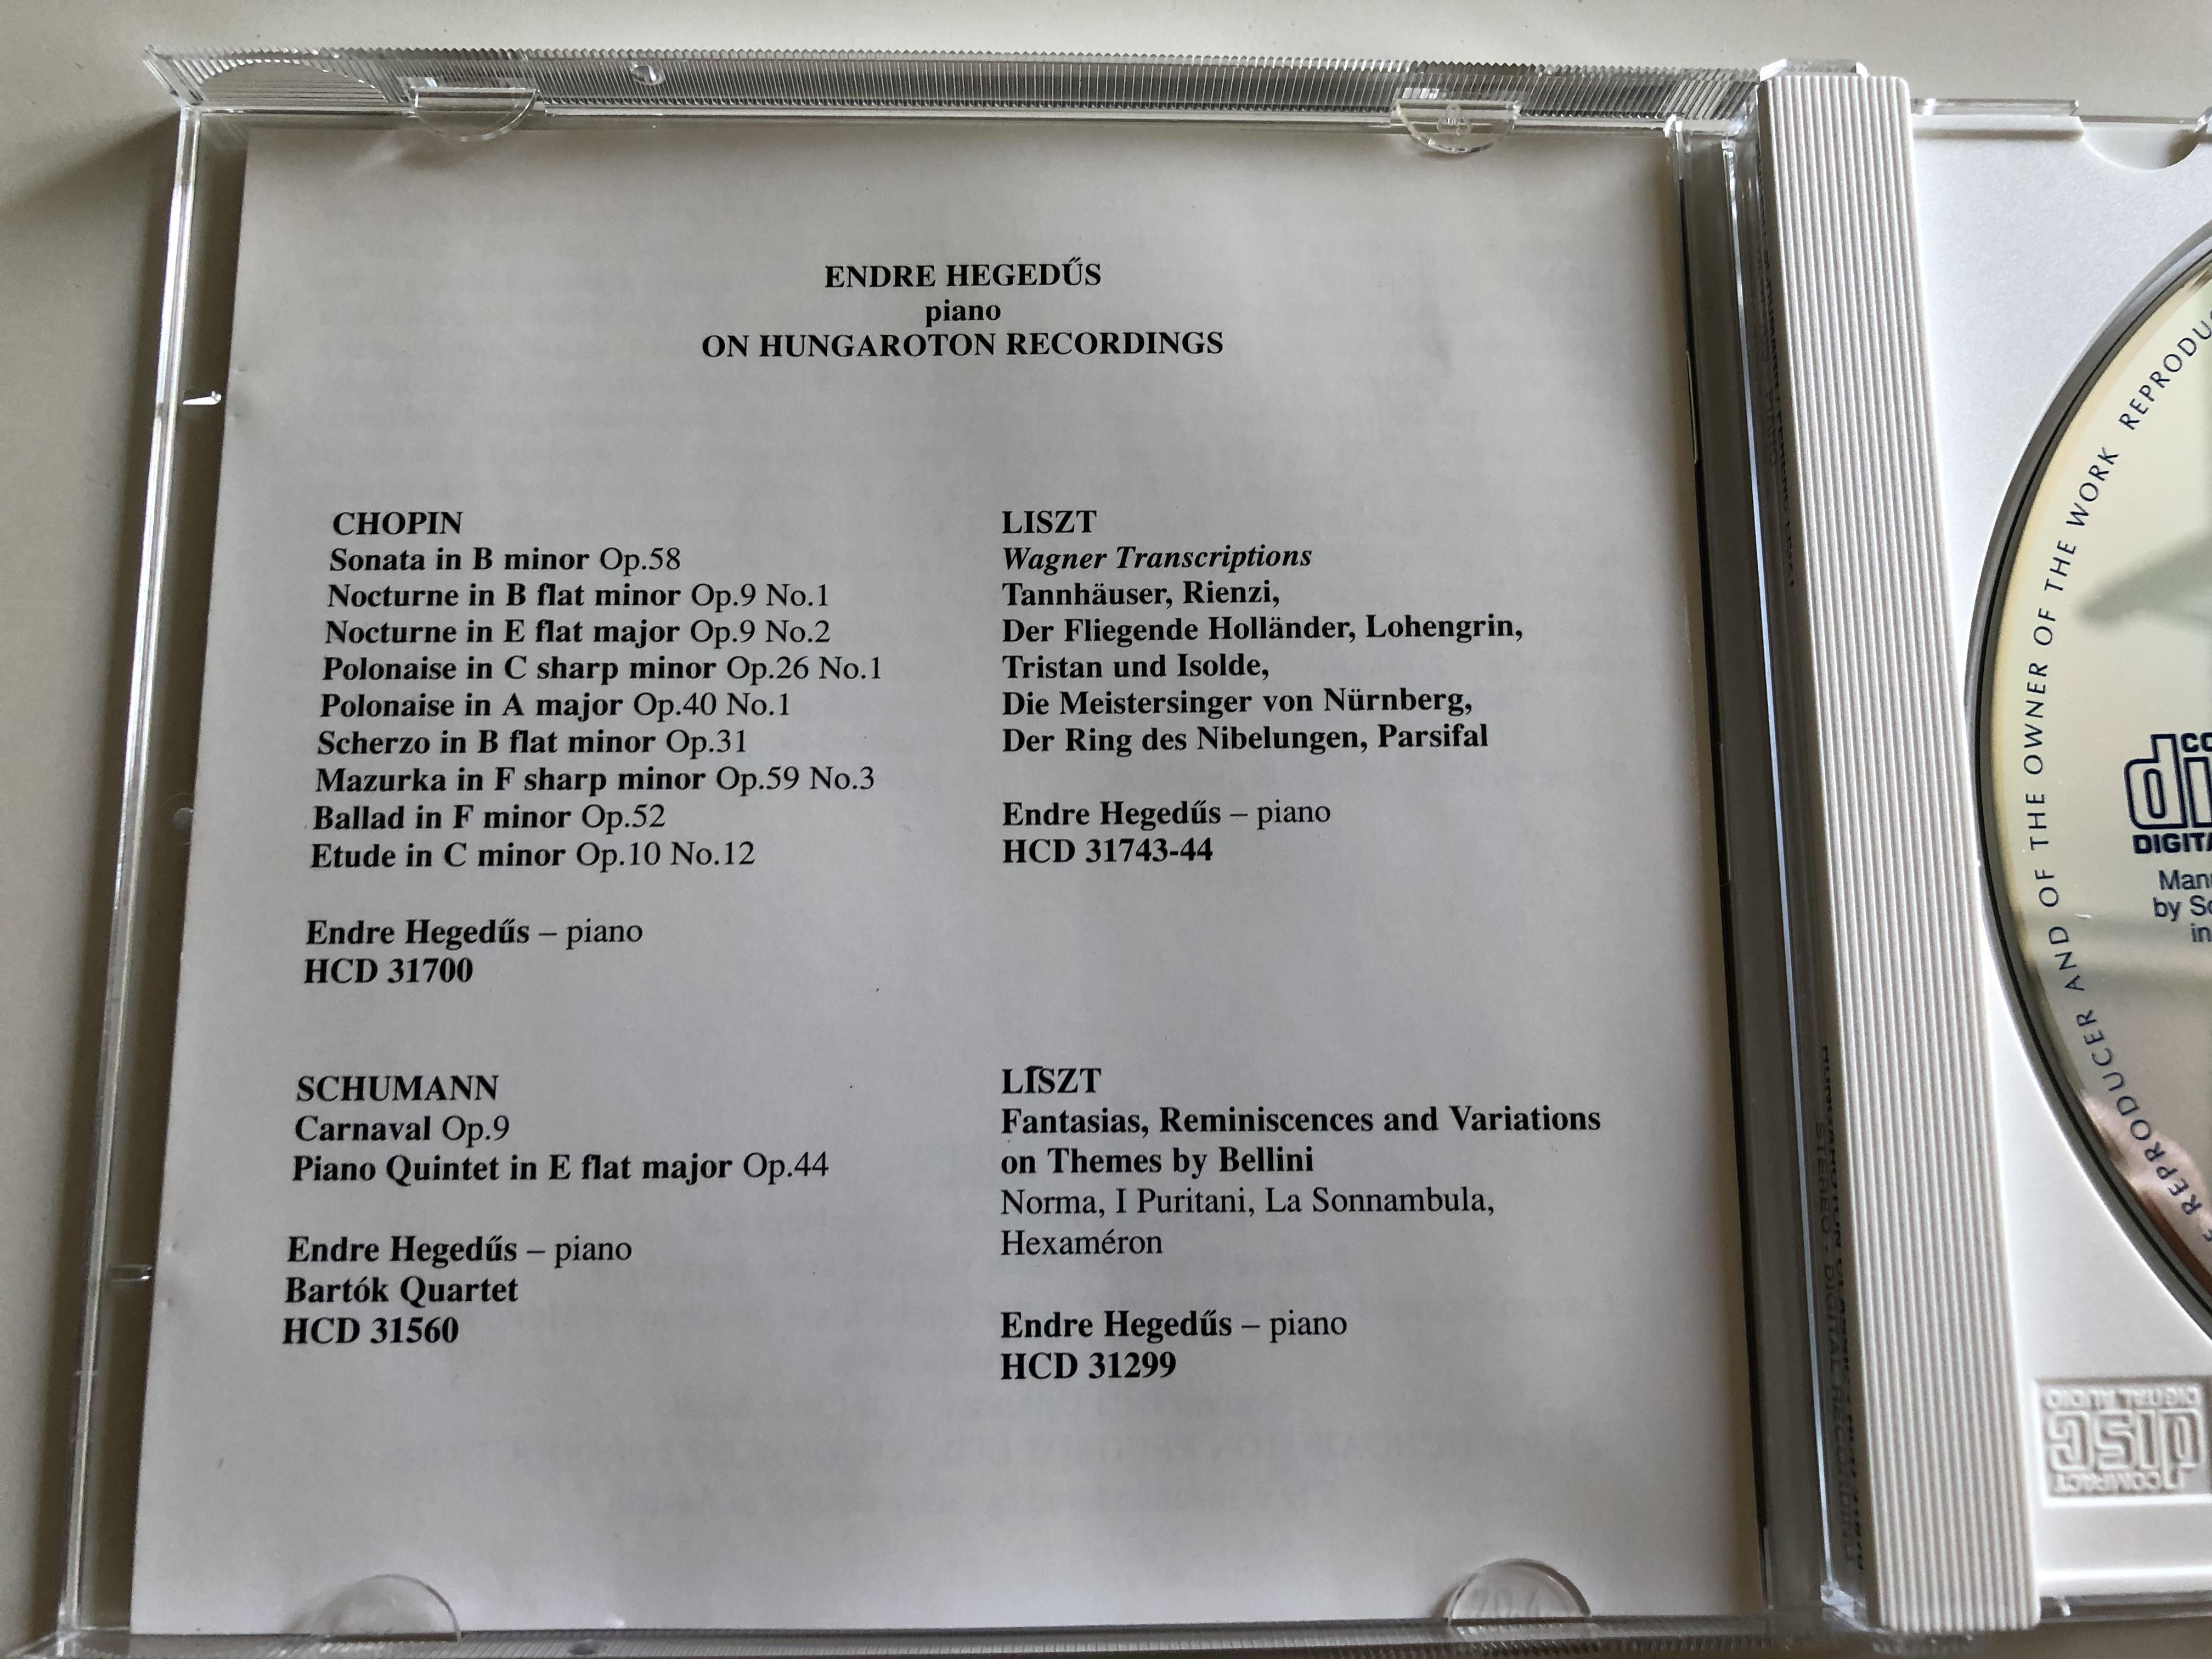 schumann-symphonic-etudes-liszt-sonata-in-b-minor-endre-heged-s-piano-live-recording-hungaroton-classic-audio-cd-1999-hcd-31870-7-.jpg